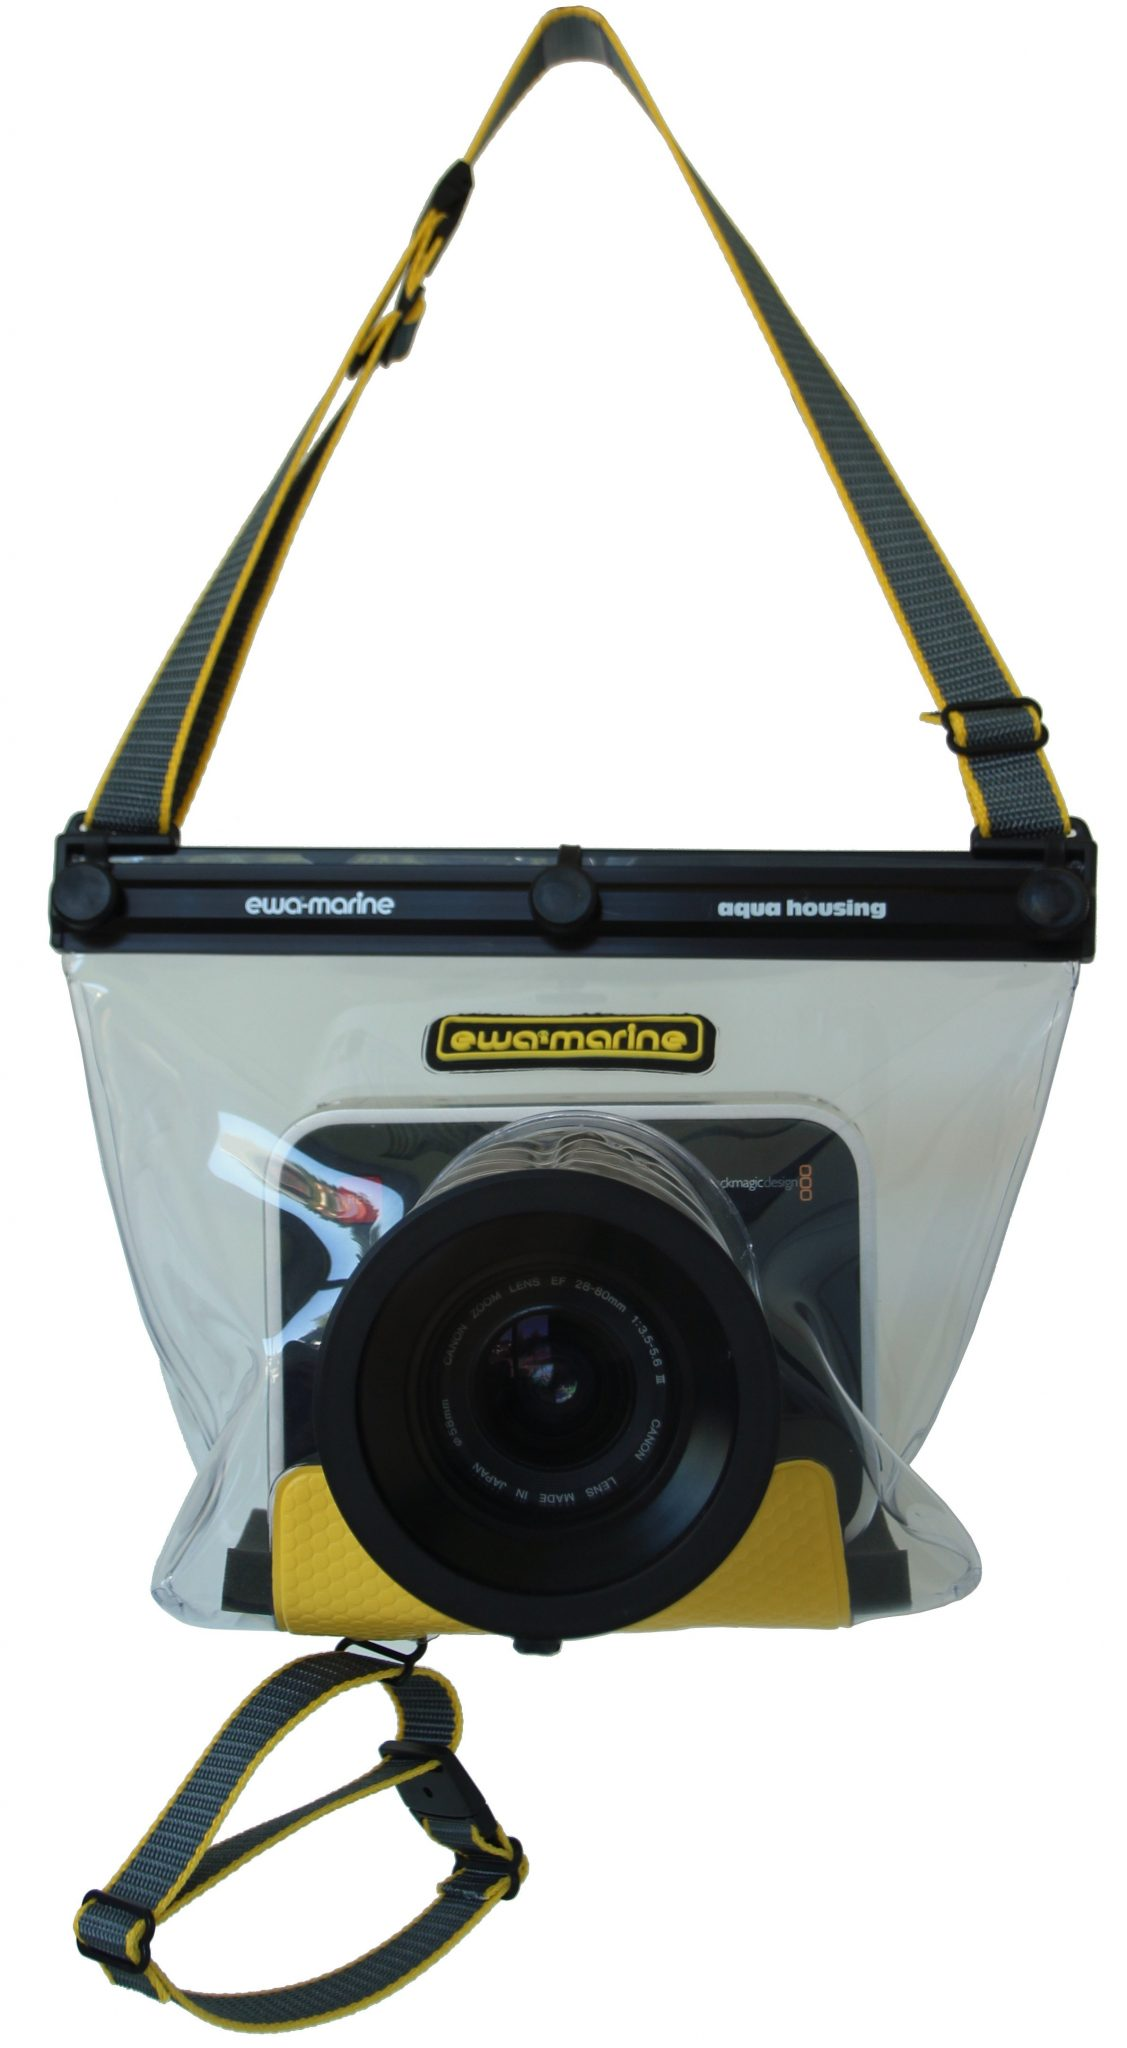 ewa-marine A-BM for Blackmagic Cinema Camera